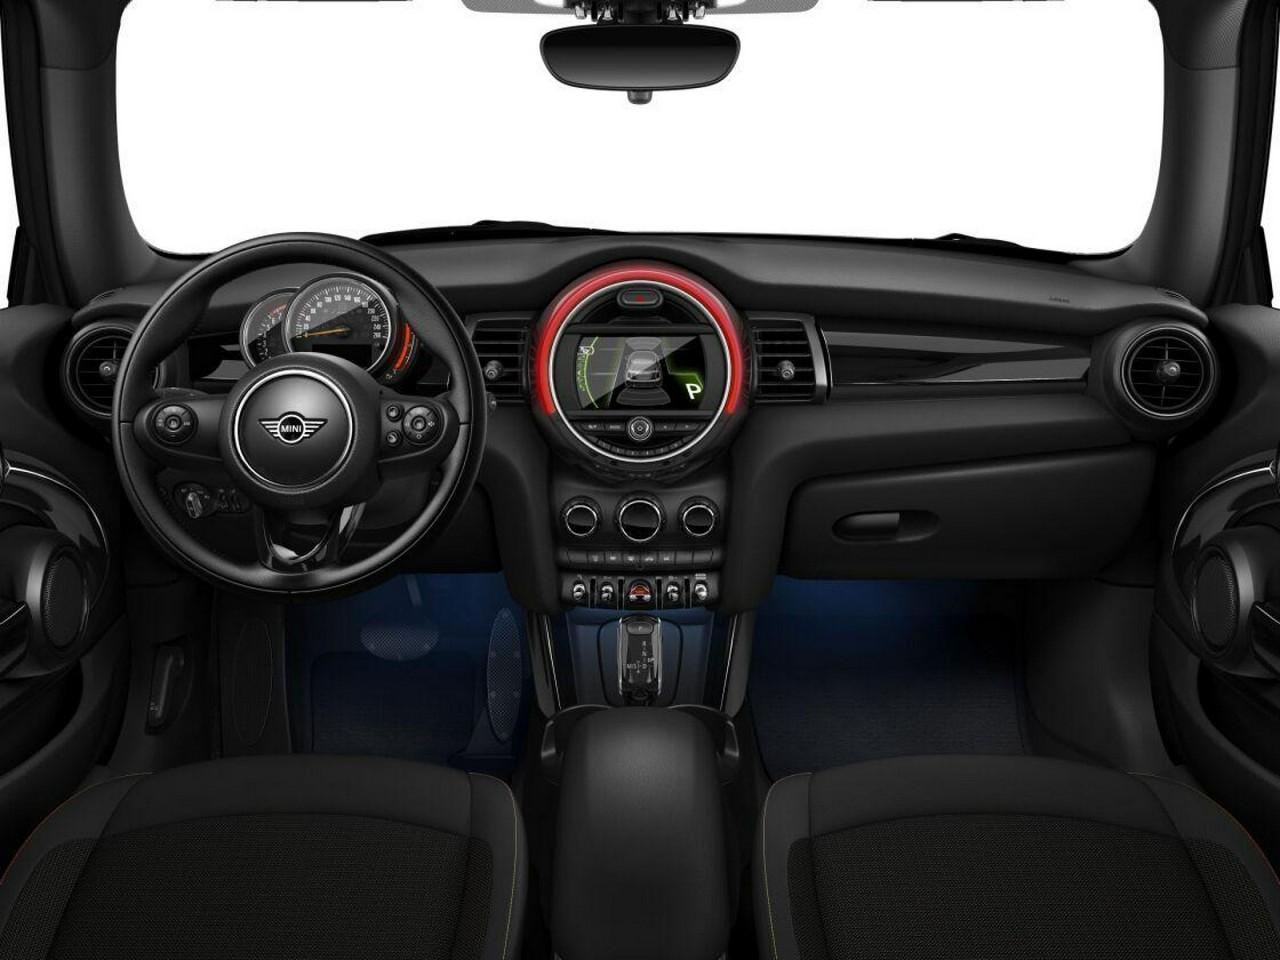 Mini Cooper 3drz | LED | Asyst. parkowania | Dostęp komf. |_2